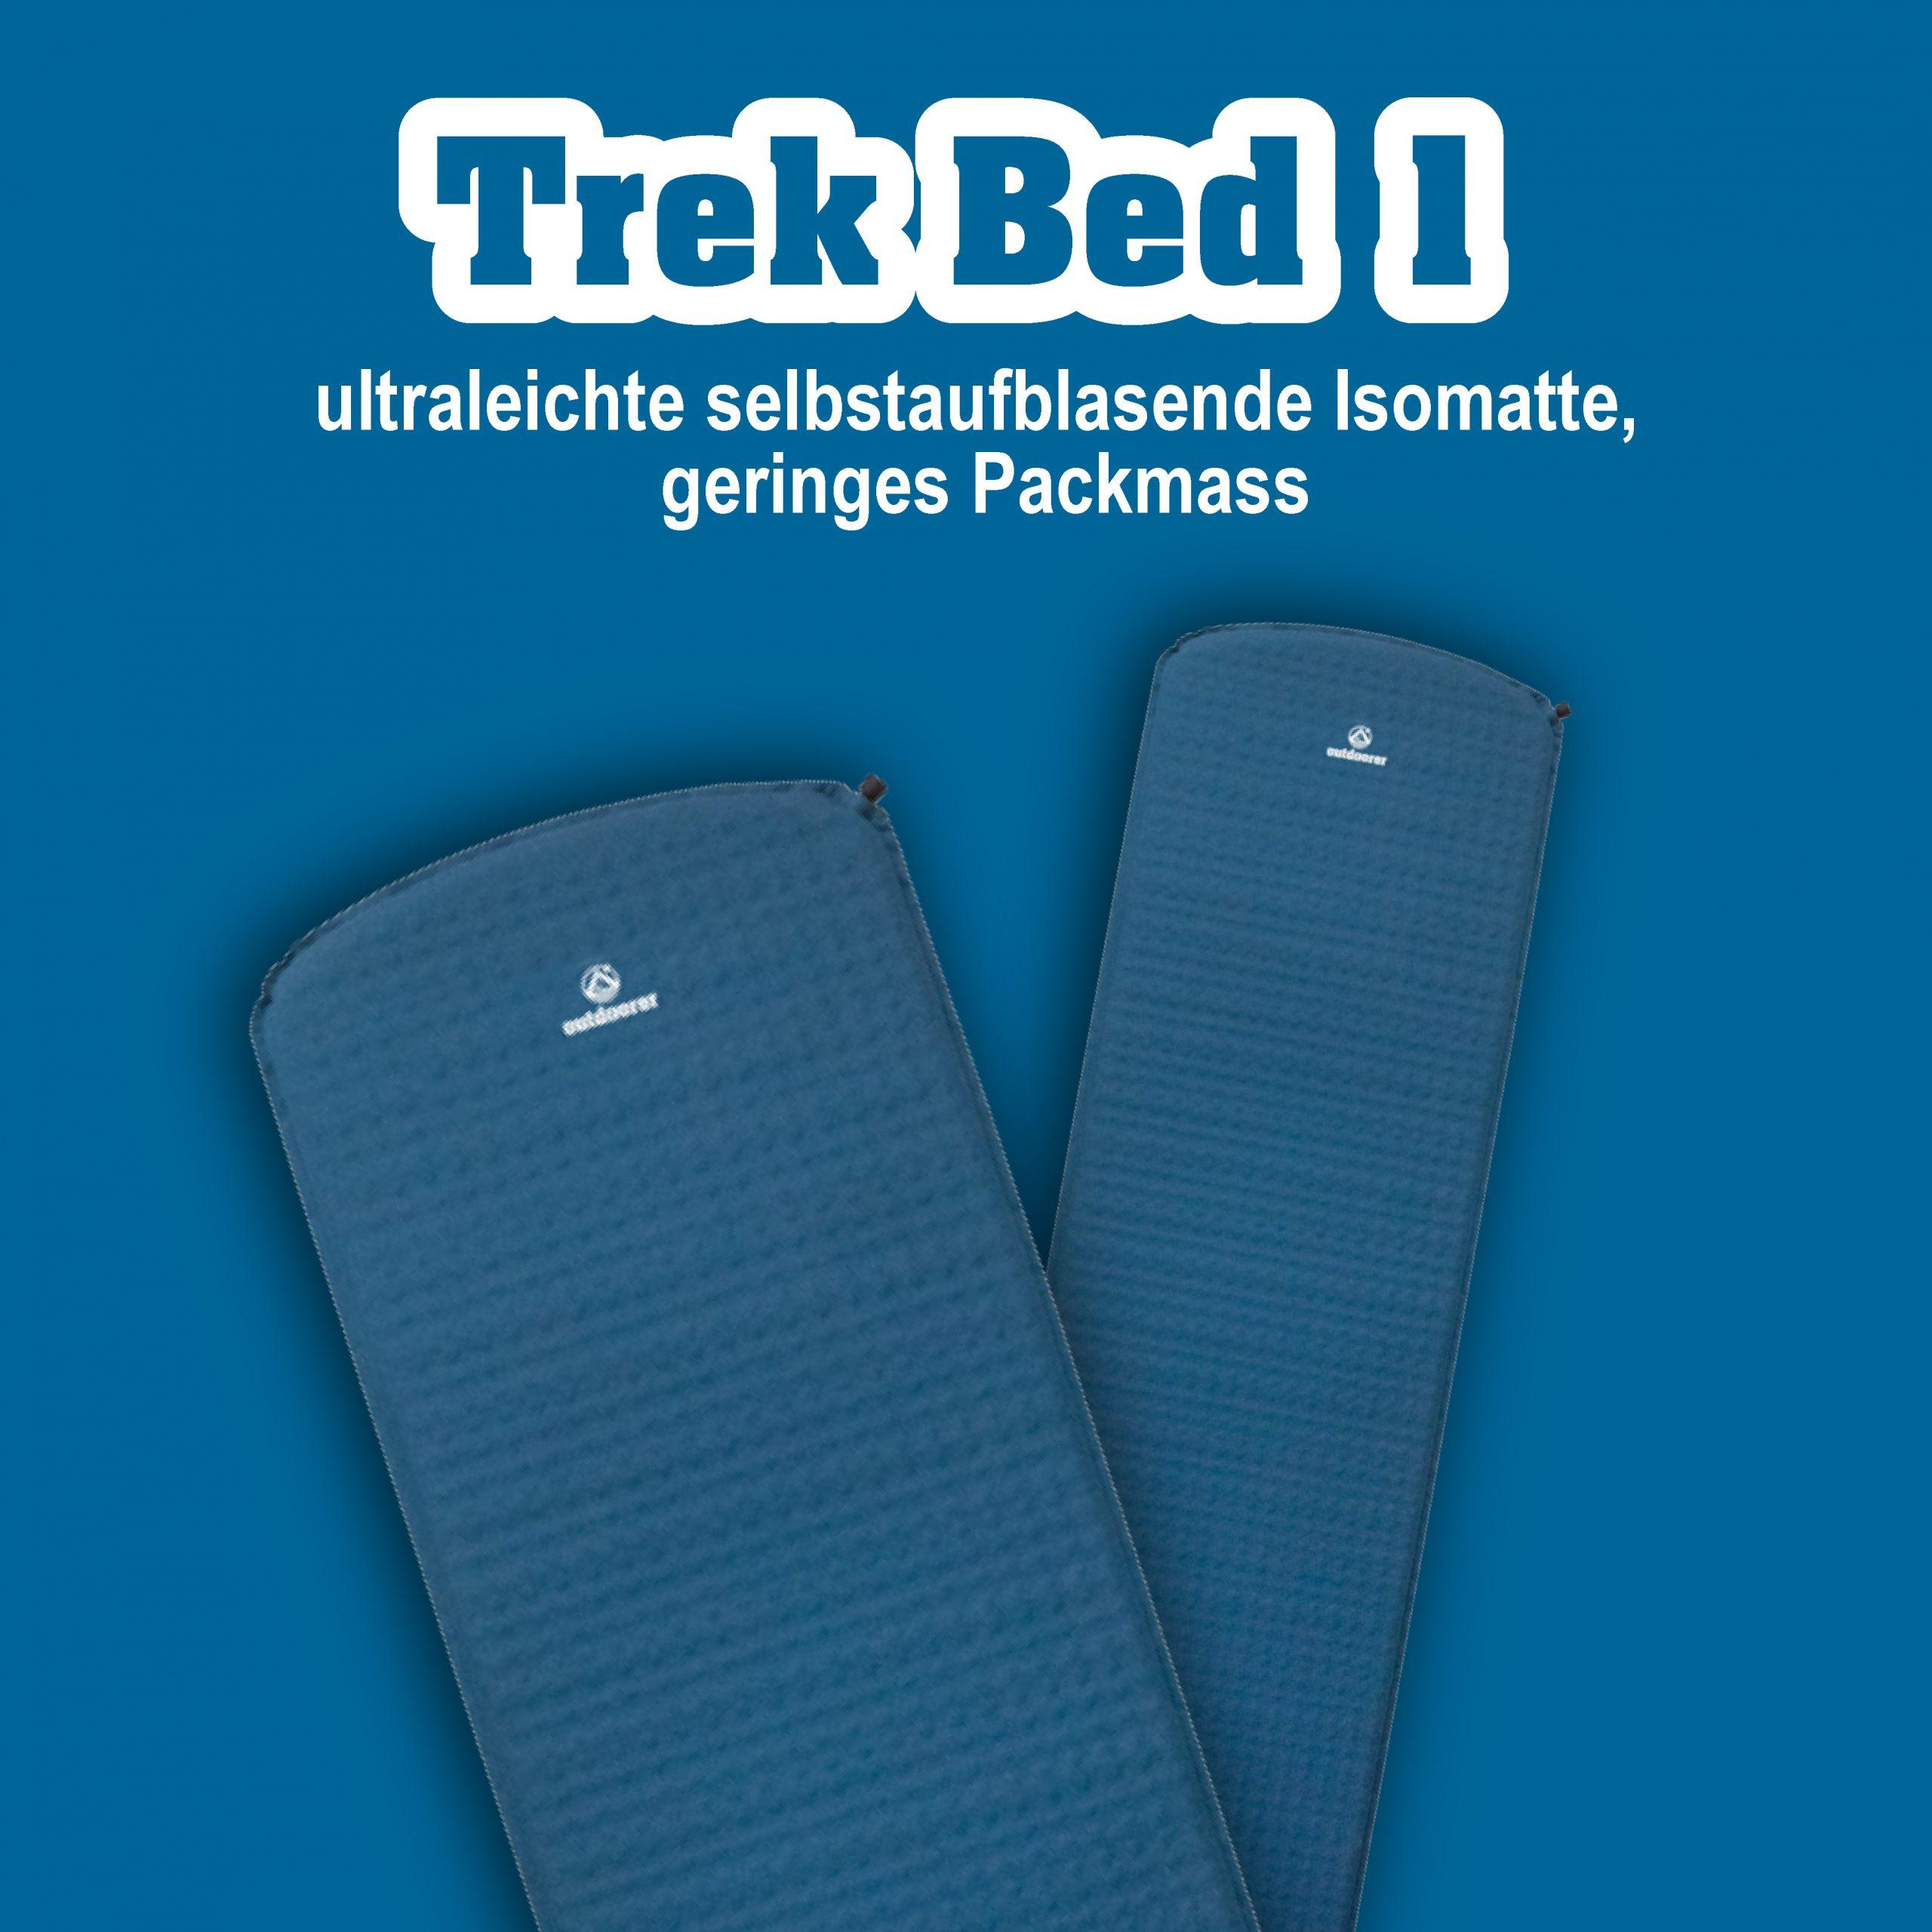 Trek Bed 1 outdoorer Isomatte selbstaufblasend